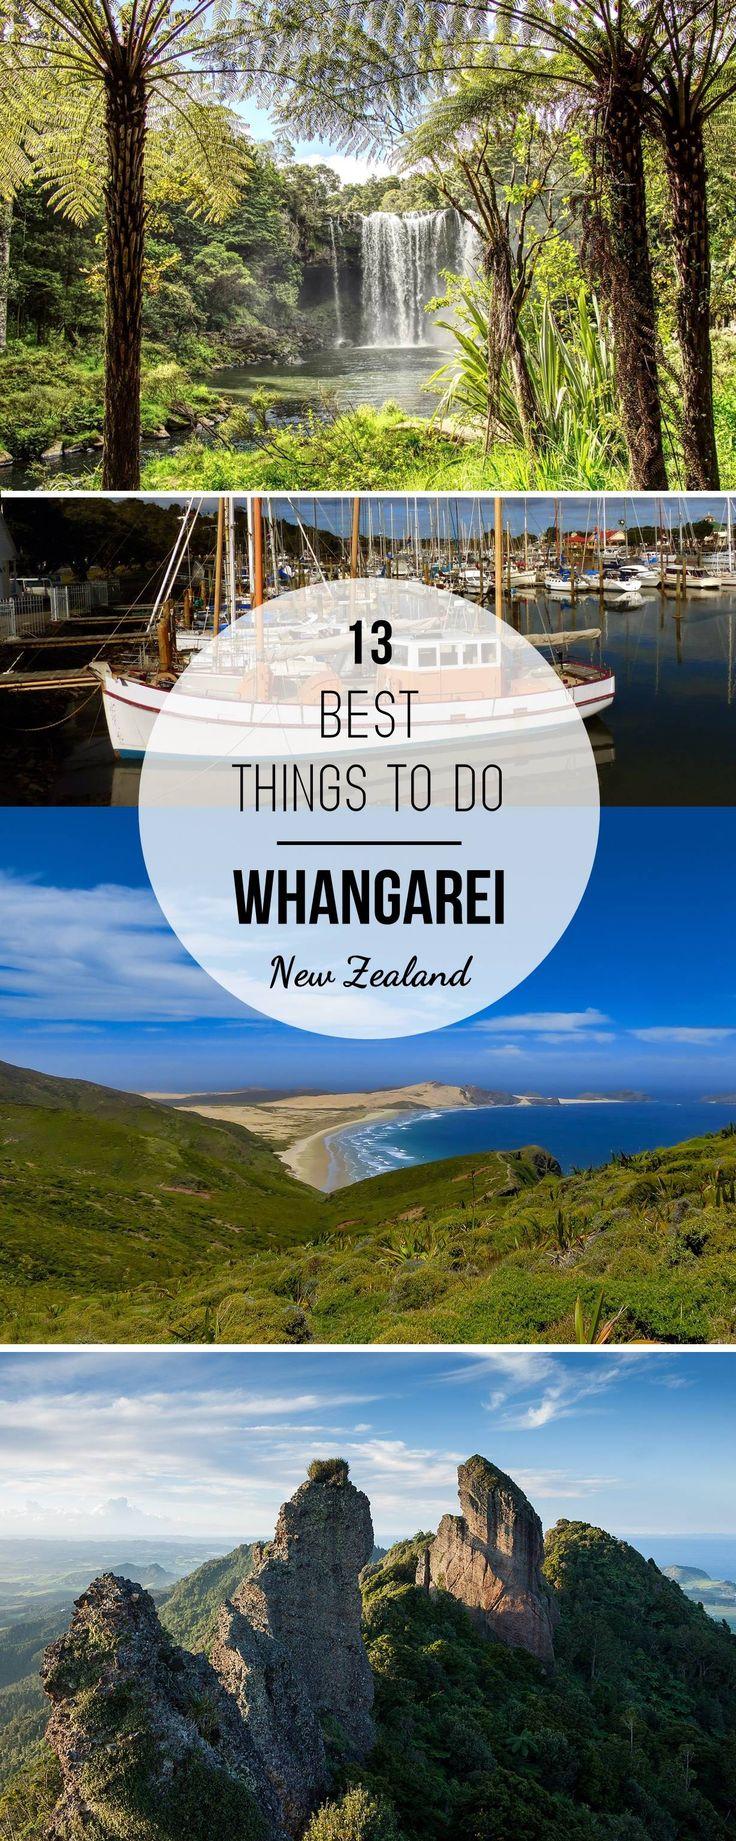 New Zealand Whangarei